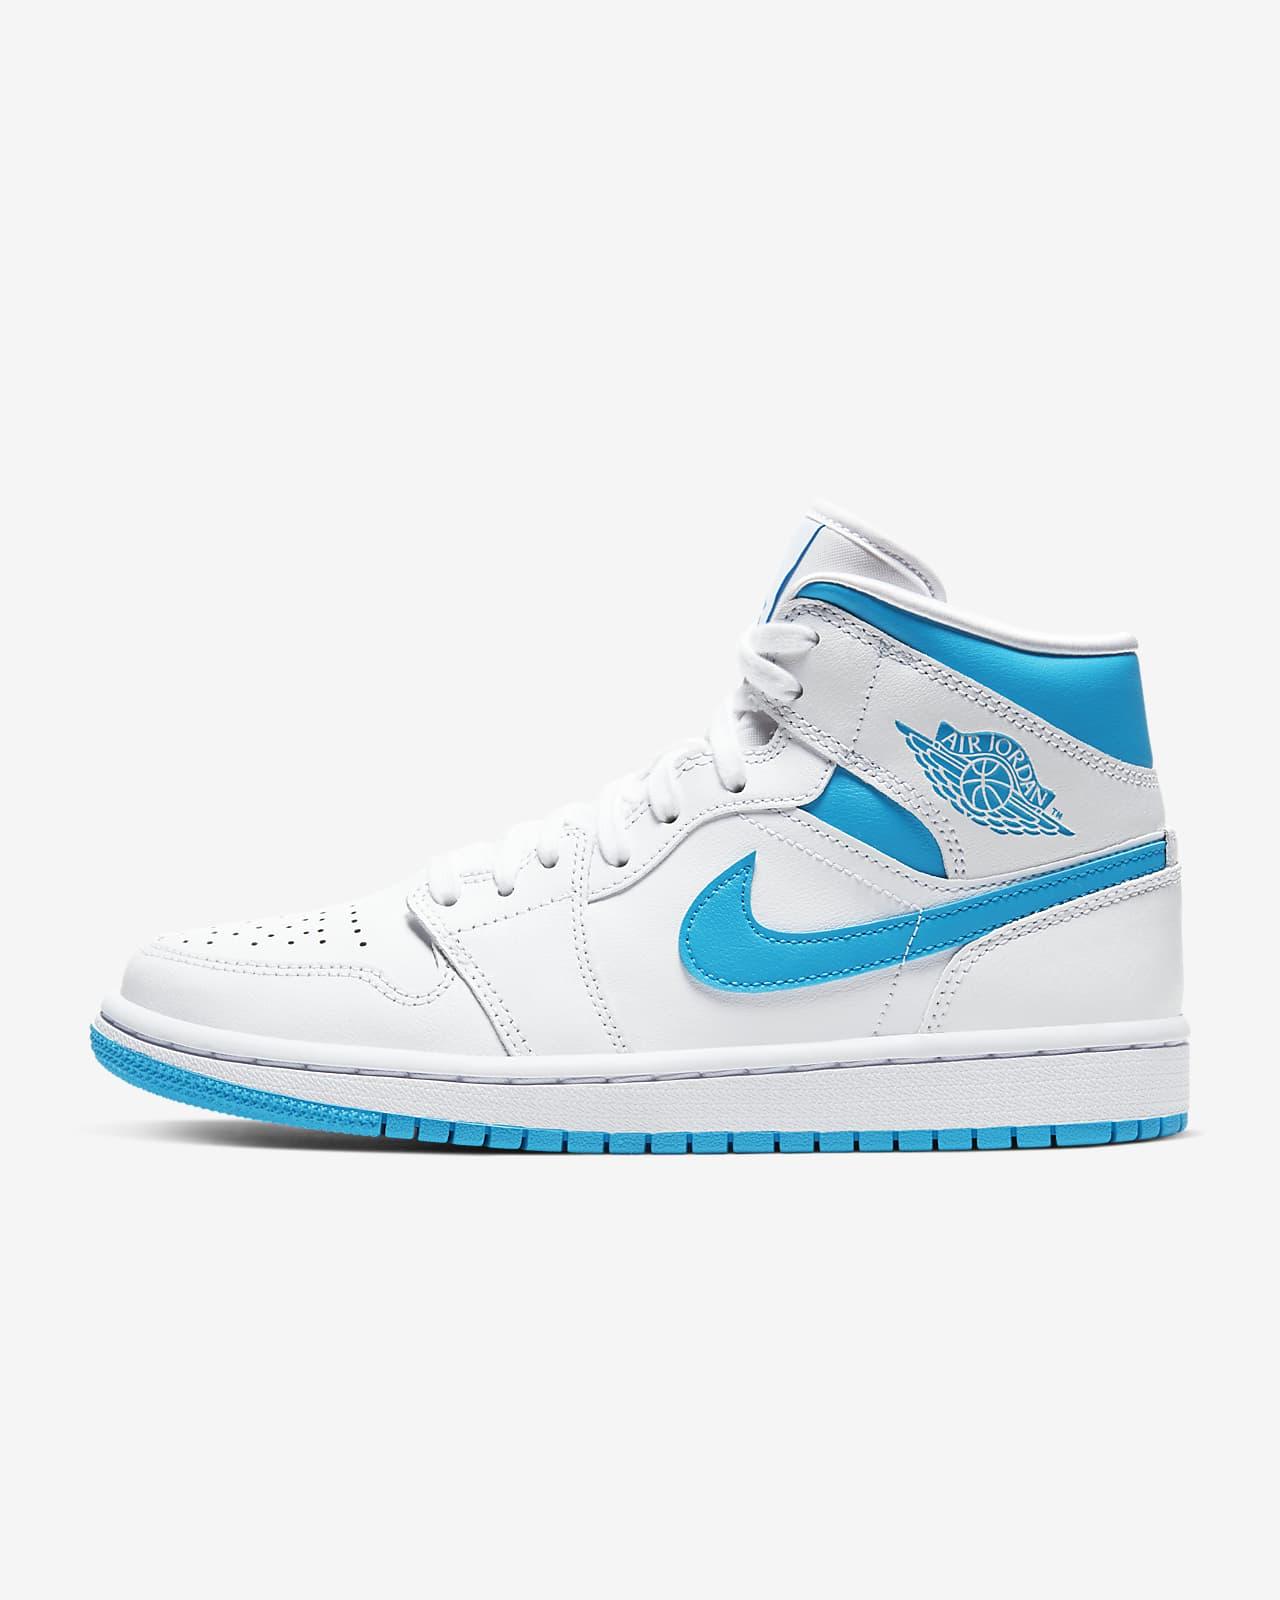 Air Jordan 1 Mid Women's Shoe